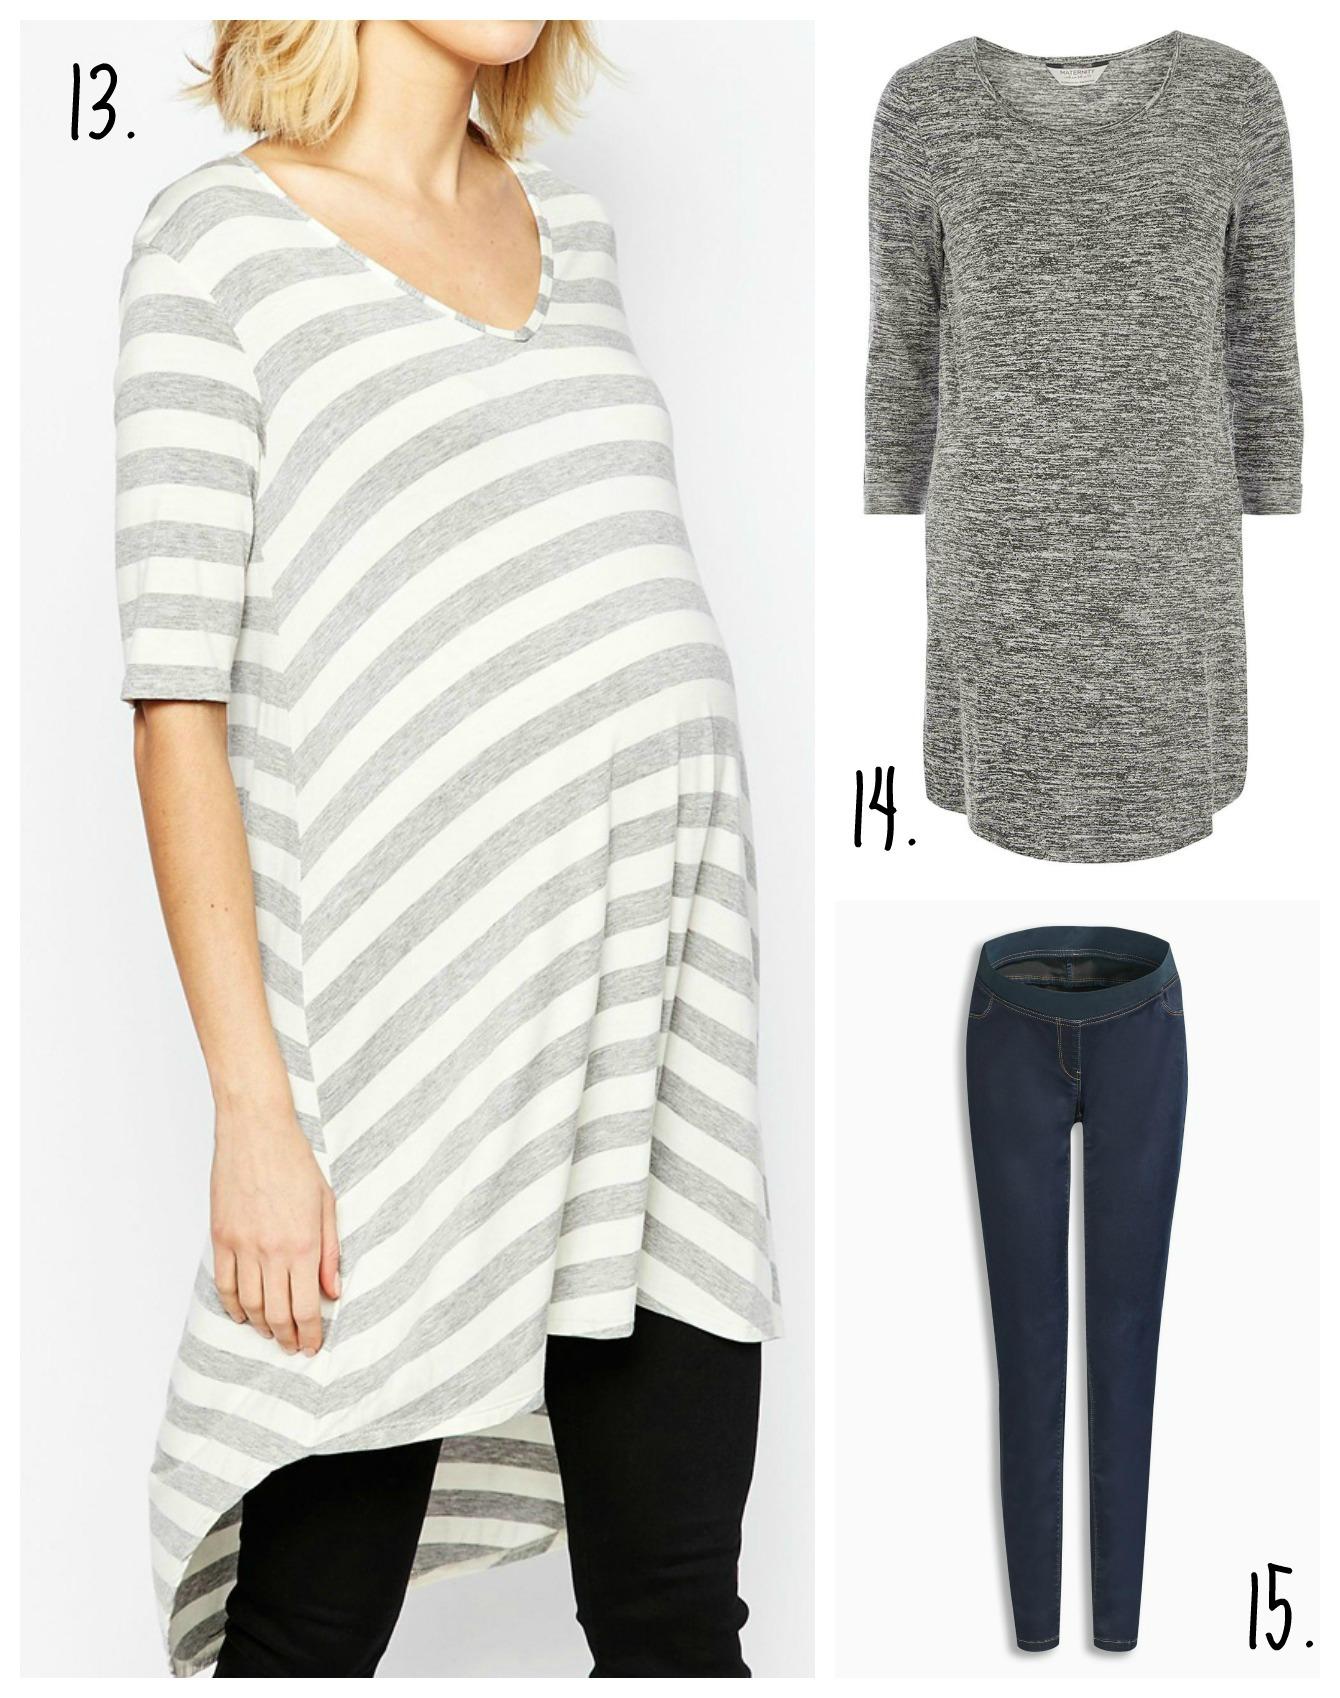 maternity hospital clothes 4